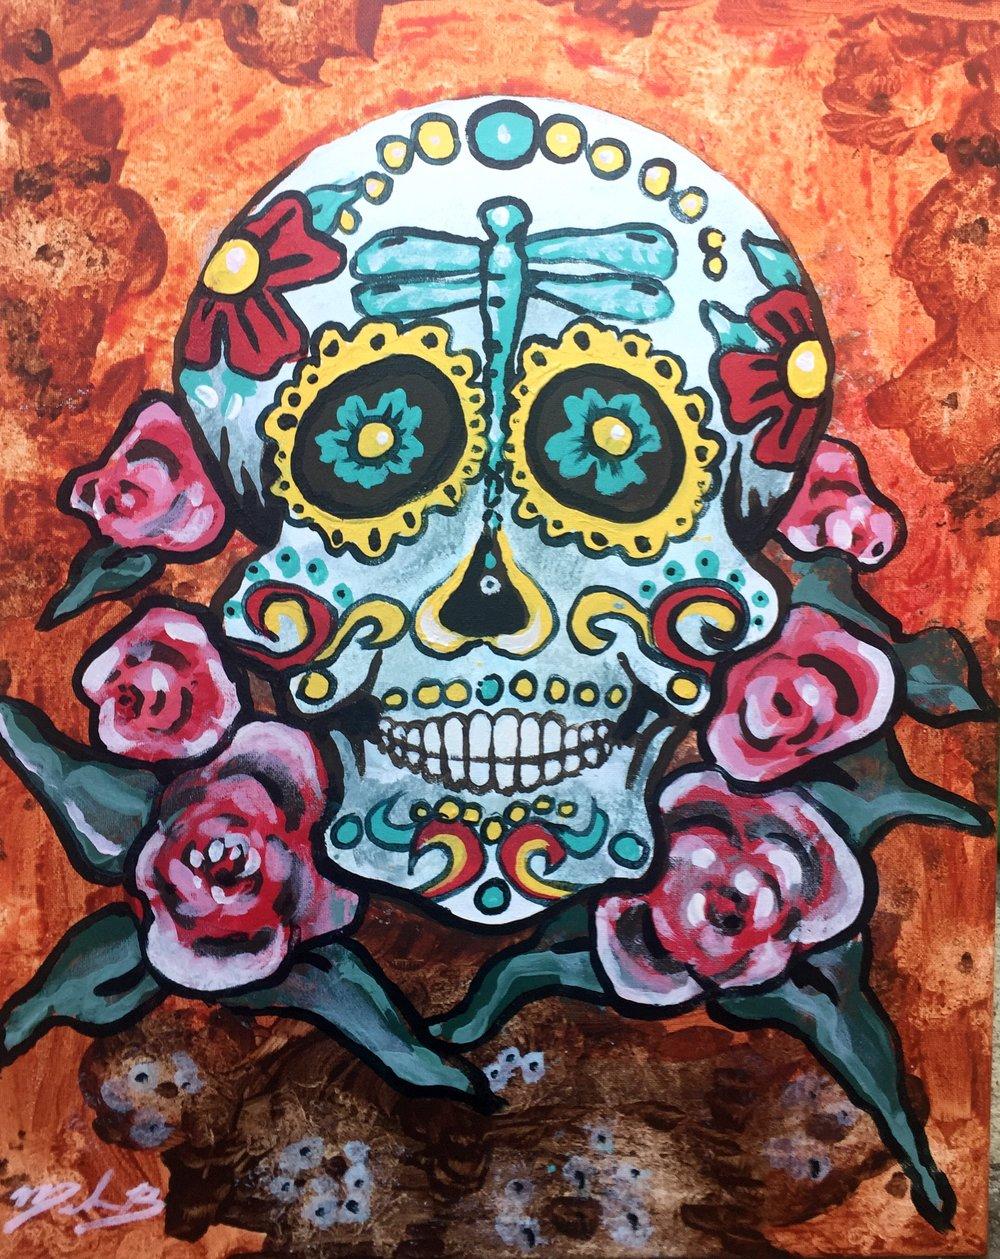 Candy Skull - 16 x 20